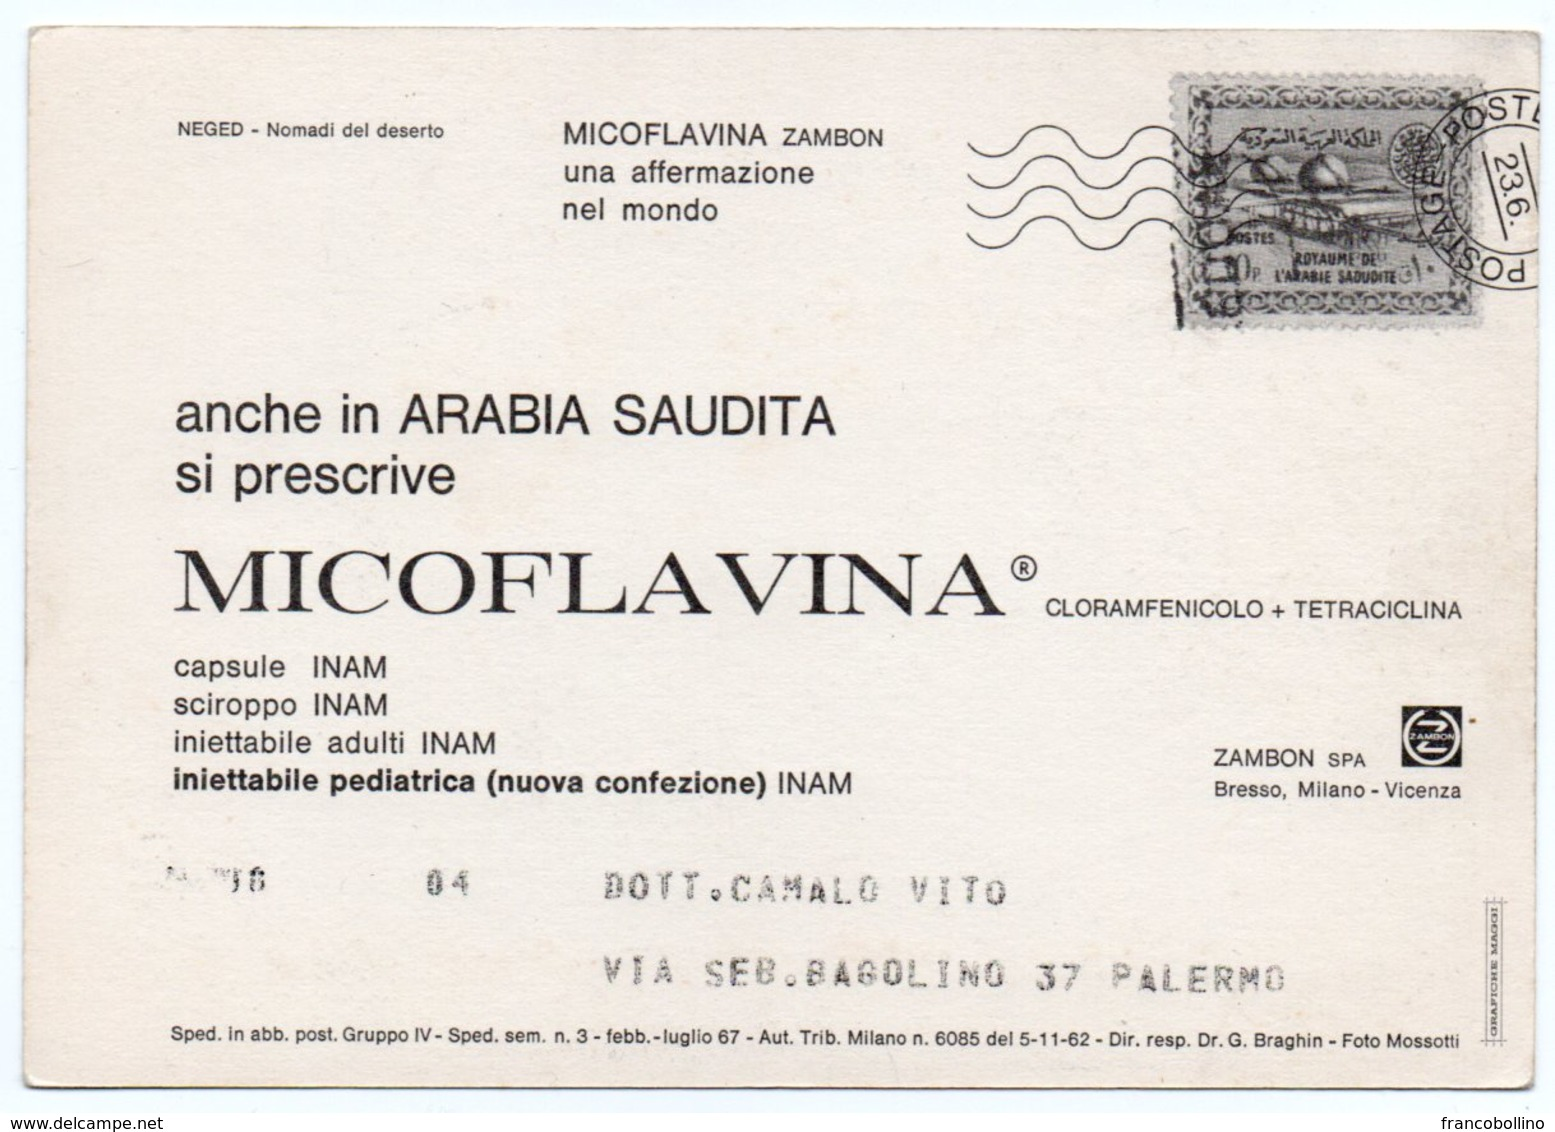 DEAR DOCTOR TYPE PUBL. MICOFLAVINA / ZAMBON - SAUDI ARABIA - NEGED-NOMADI DEL DESERTO - Arabia Saudita